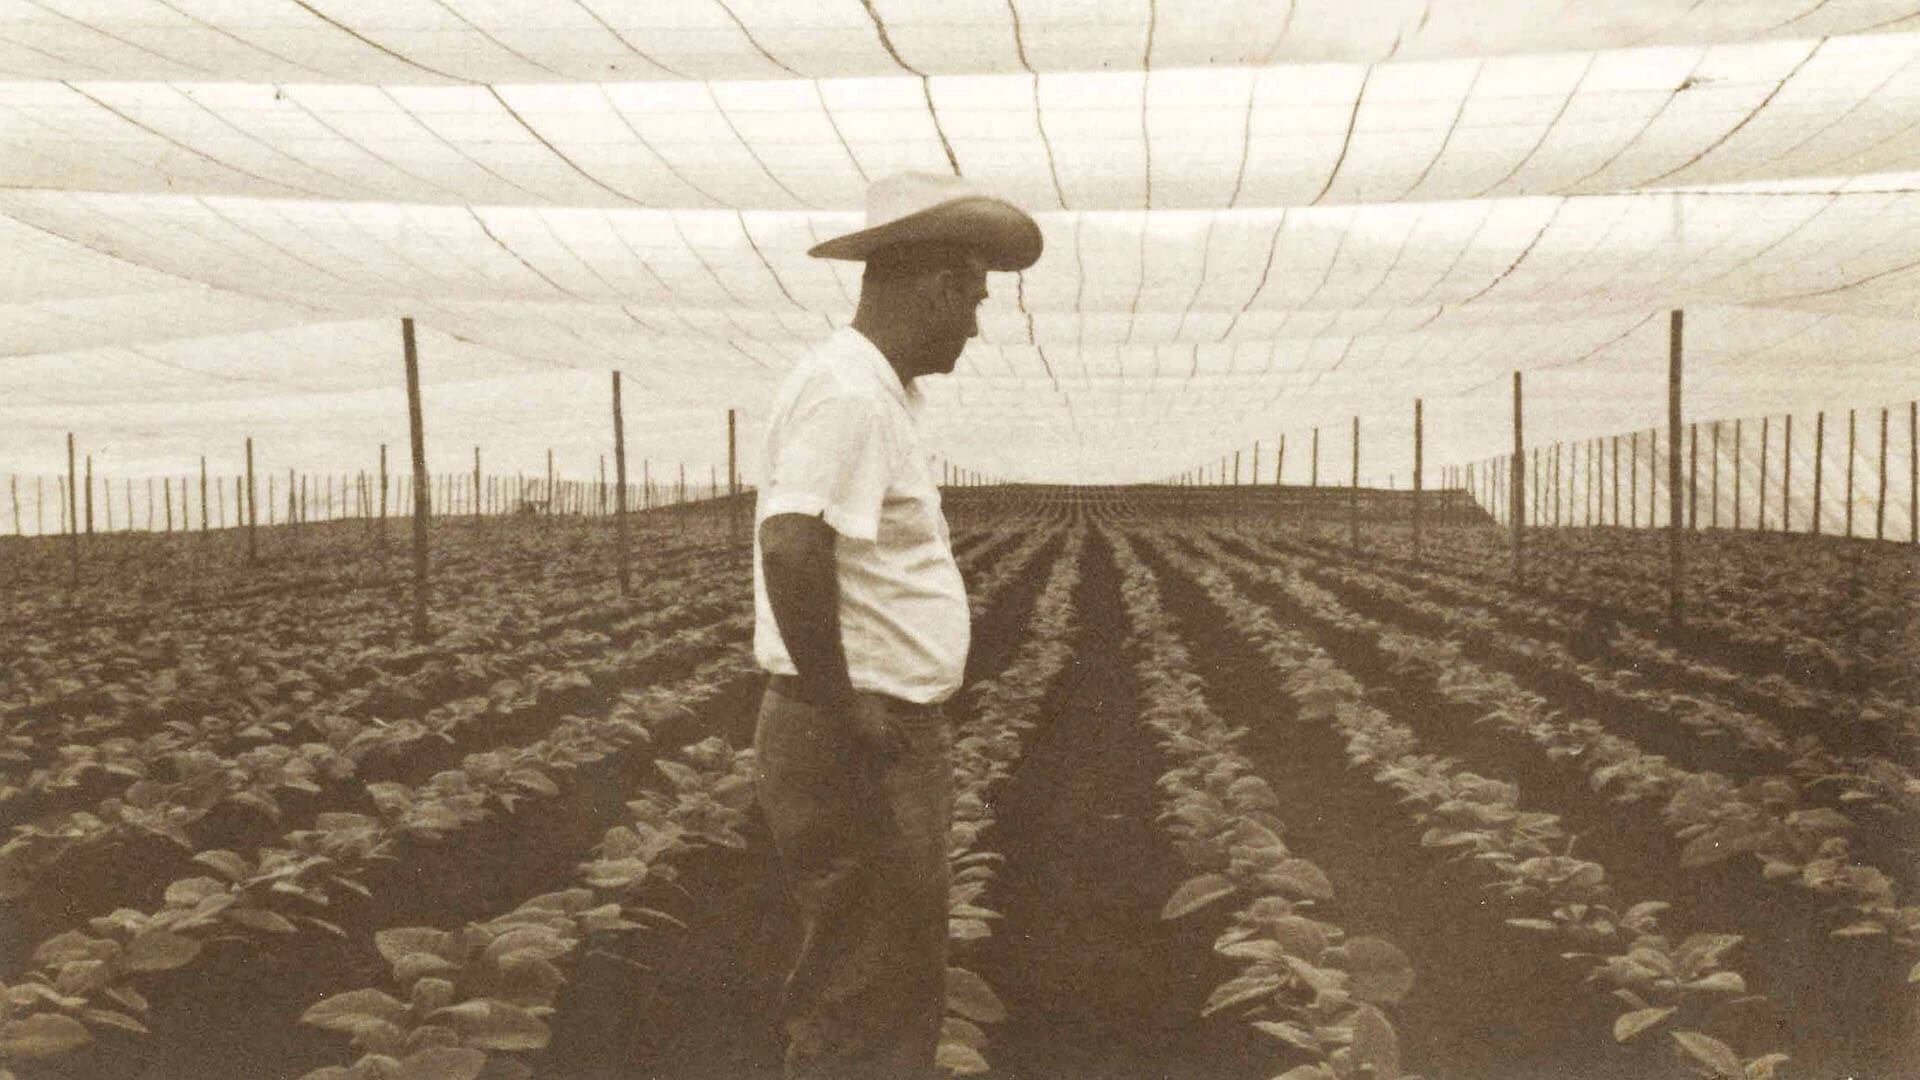 Plasencia Cigars - 1965 photo